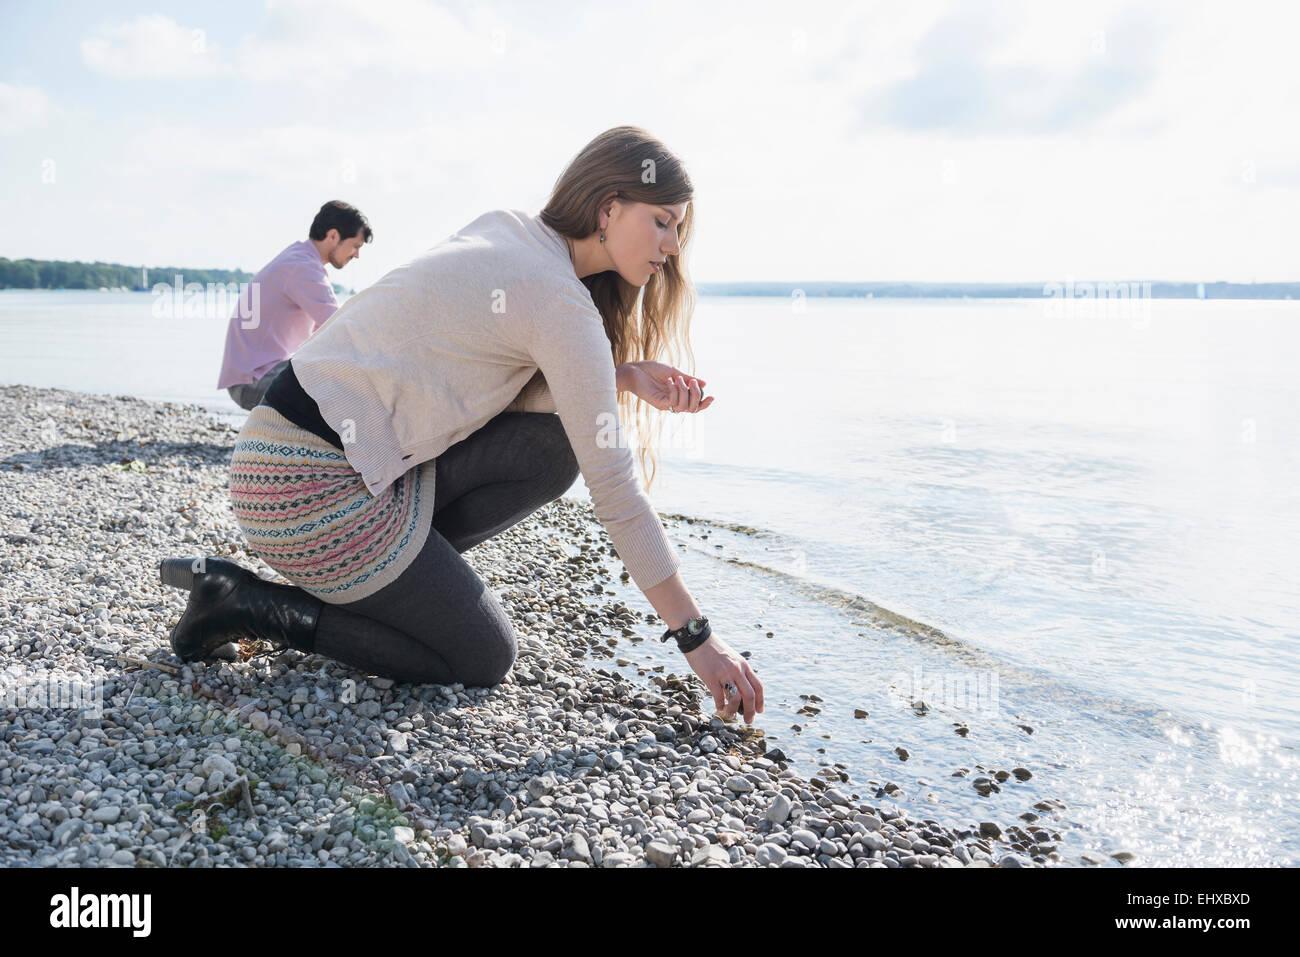 Young couple lake shore gathering pebbles - Stock Image